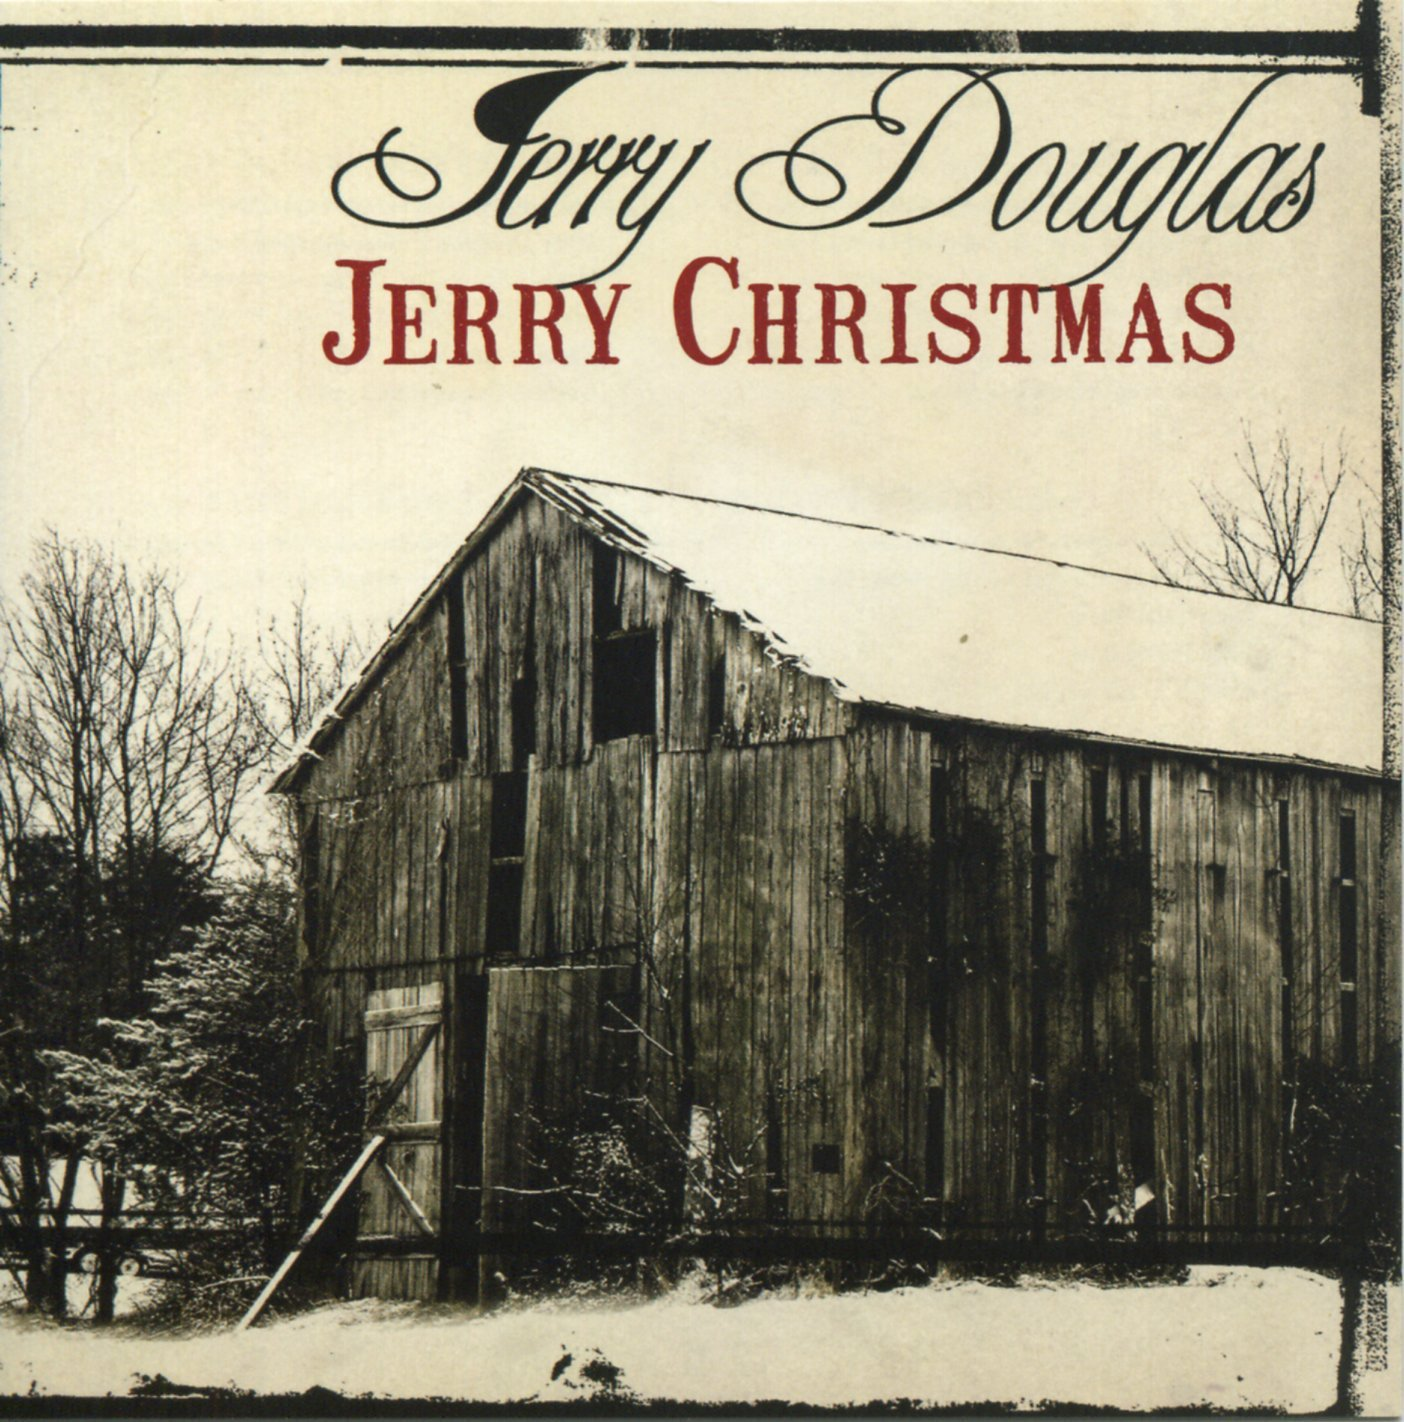 CD : Jerry Douglas - Jerry Christmas (CD)